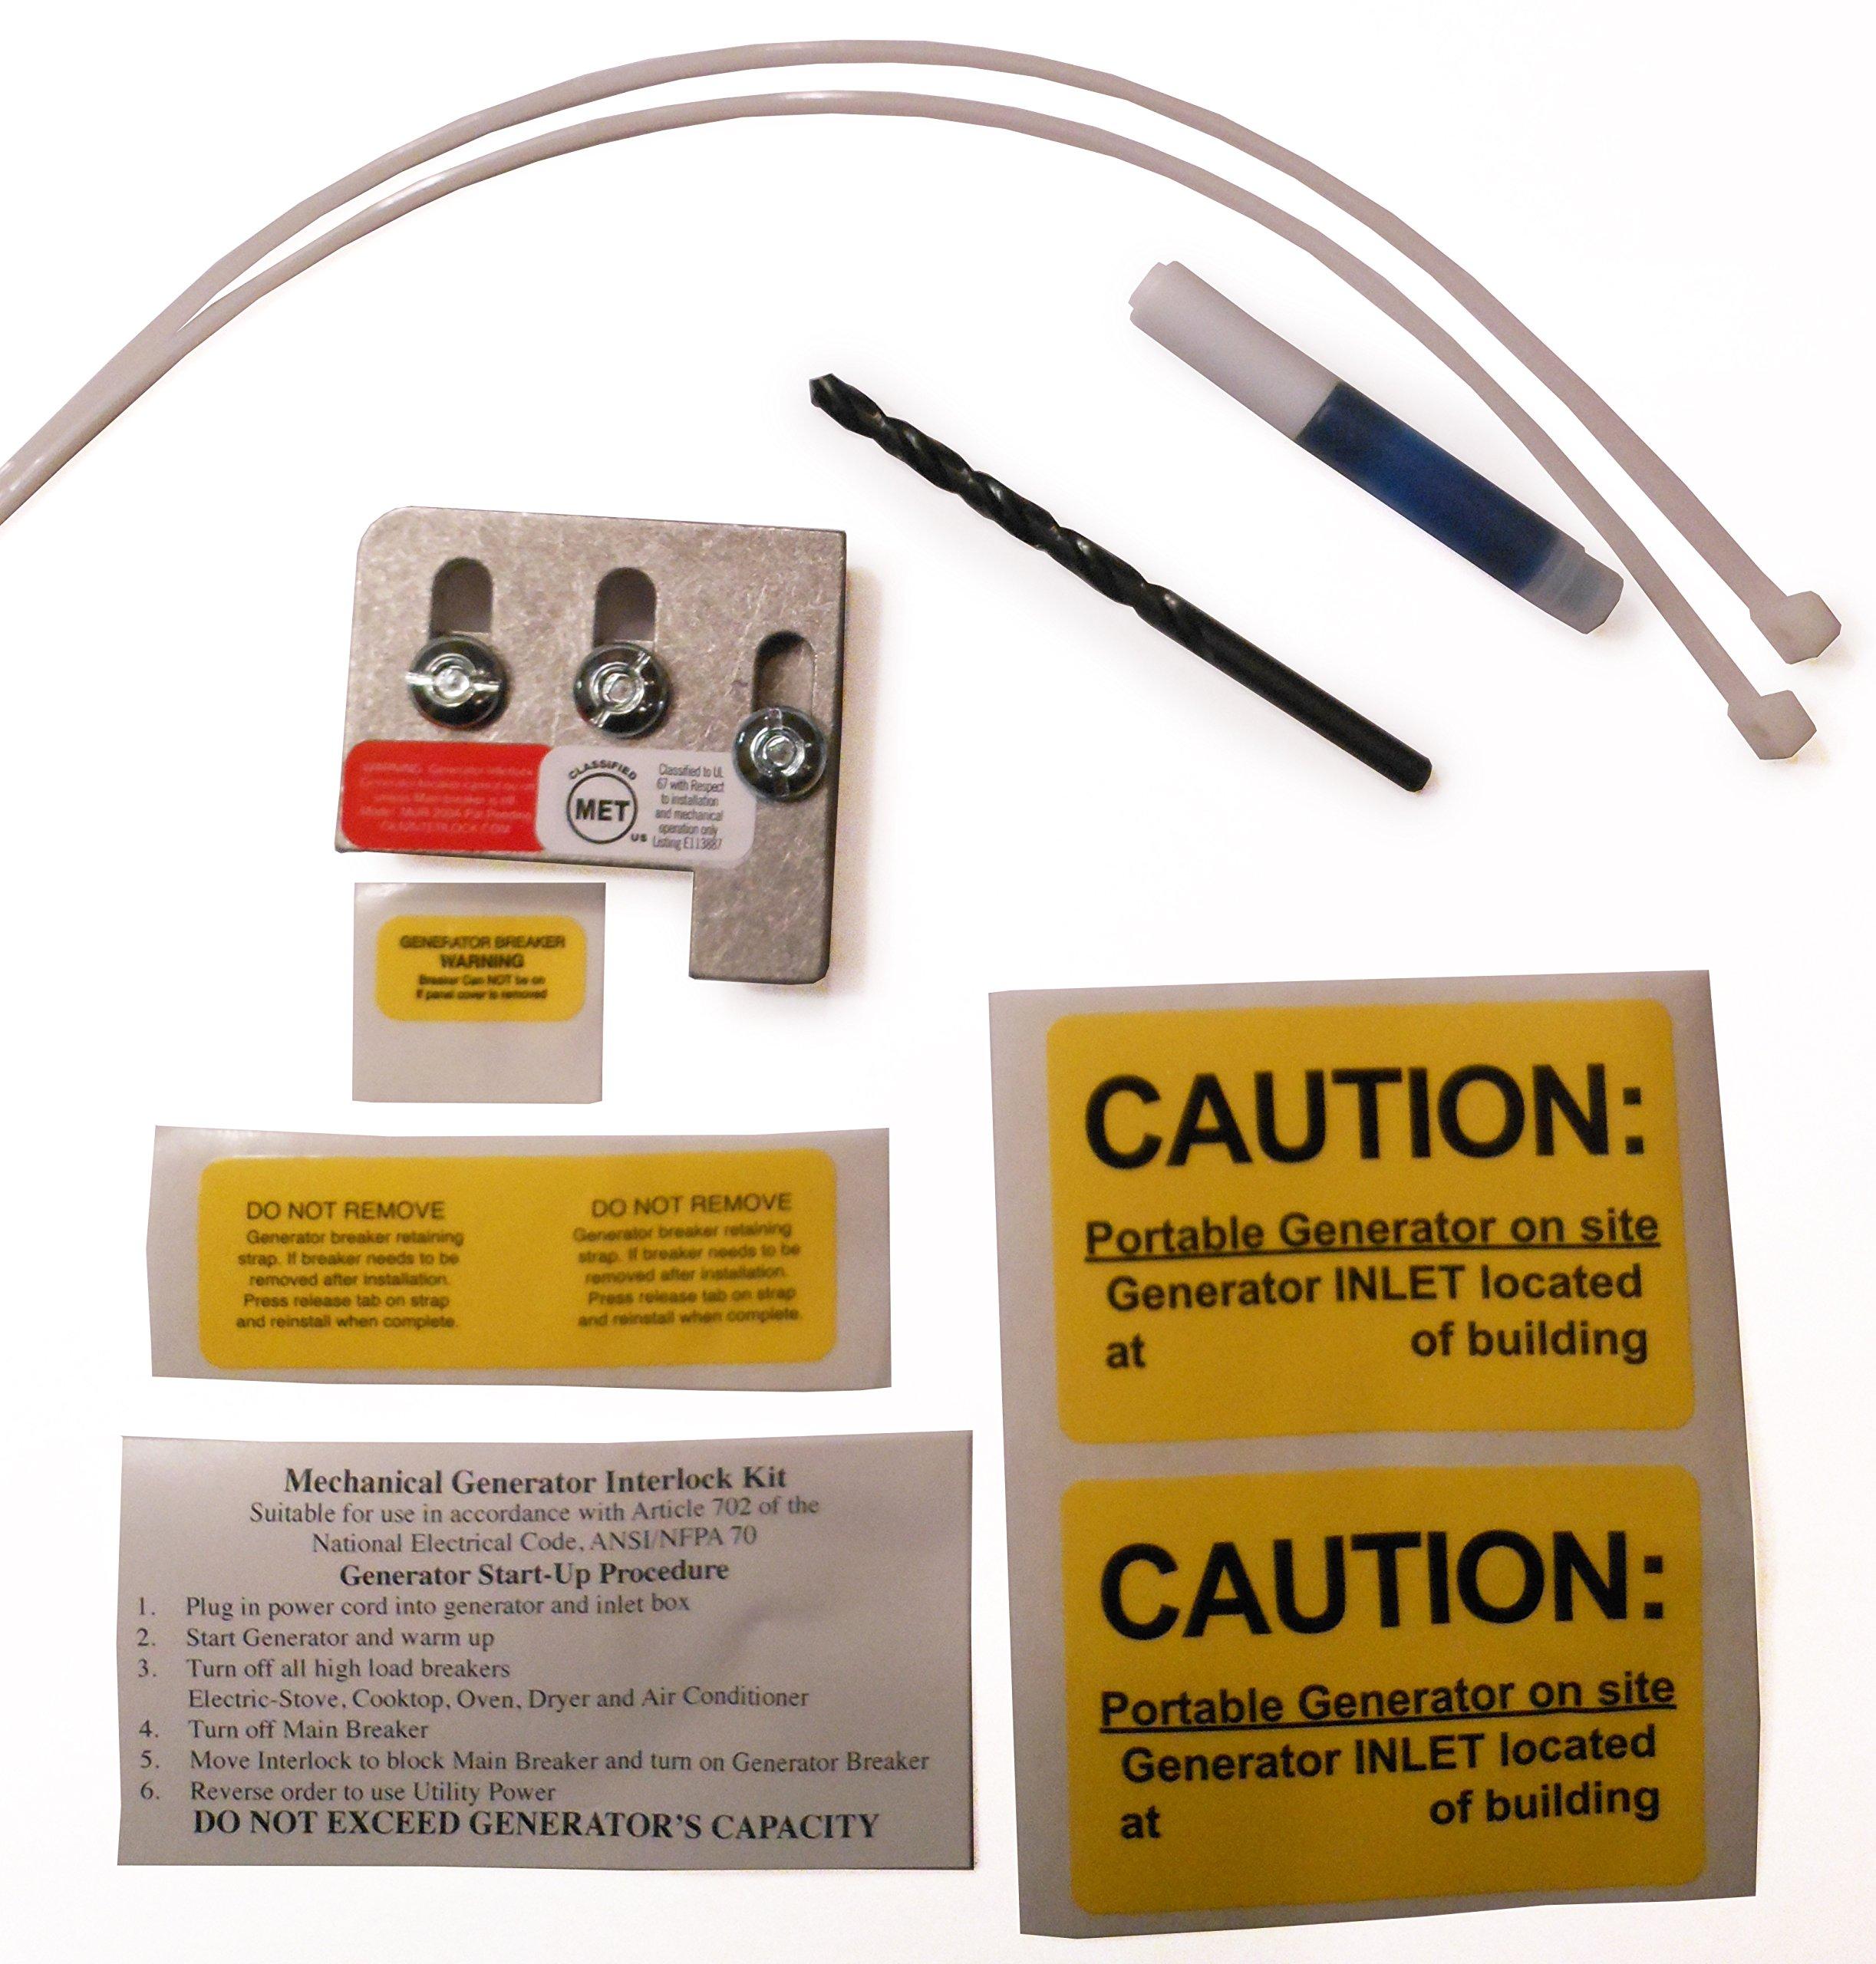 Buy GE-200HDA GE General Electric Generator Interlock Kit